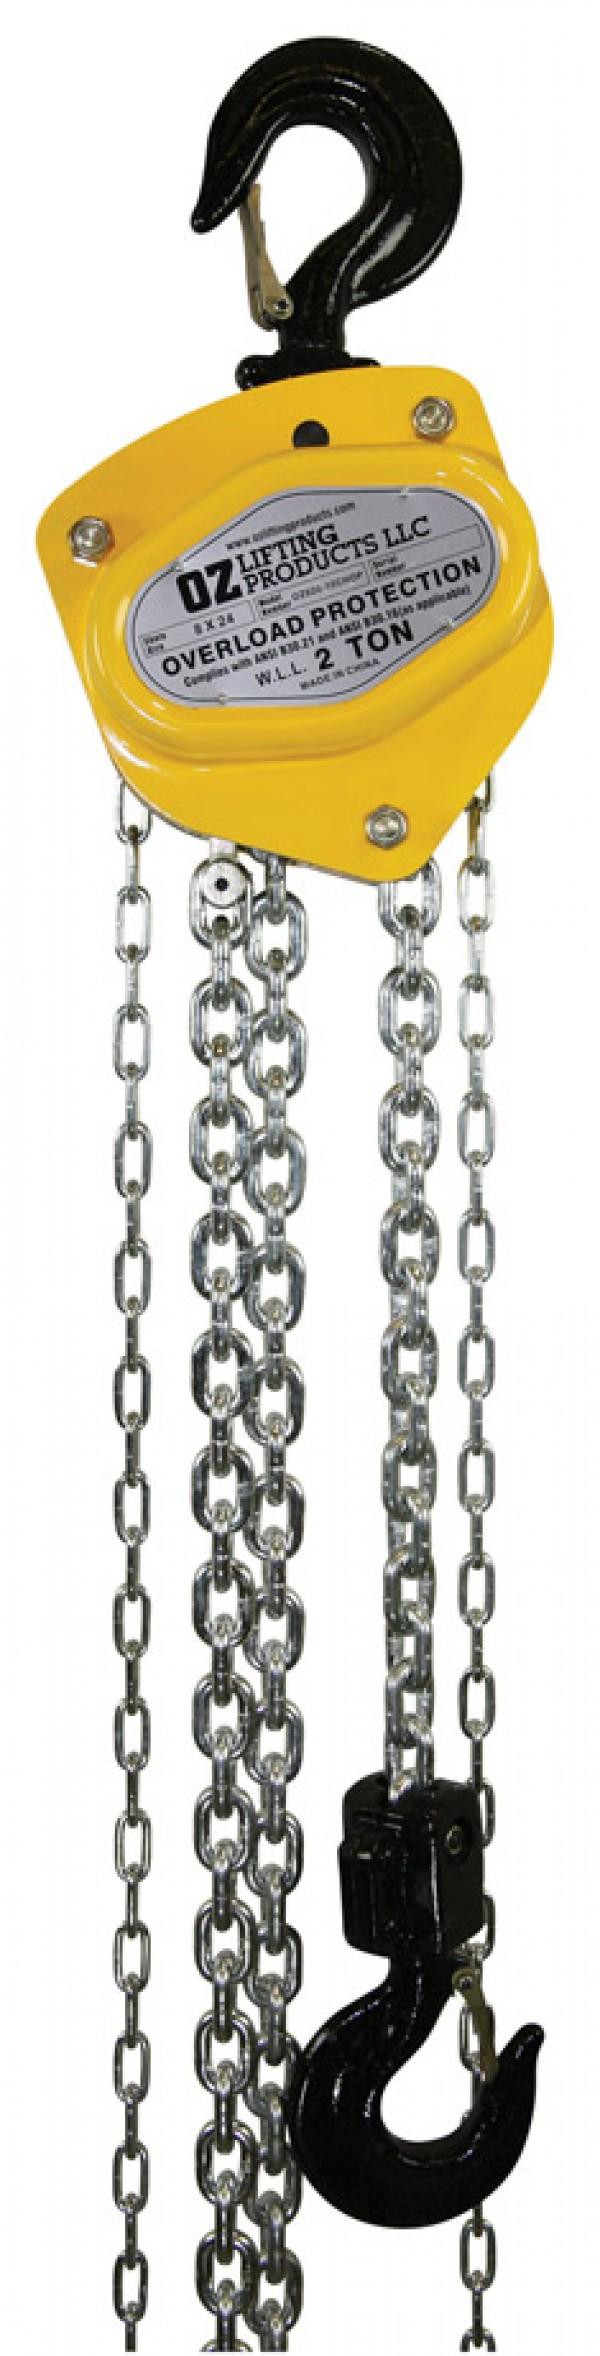 3 Ton OZ Chain Hoist with Overload Protection OZ030CHOP